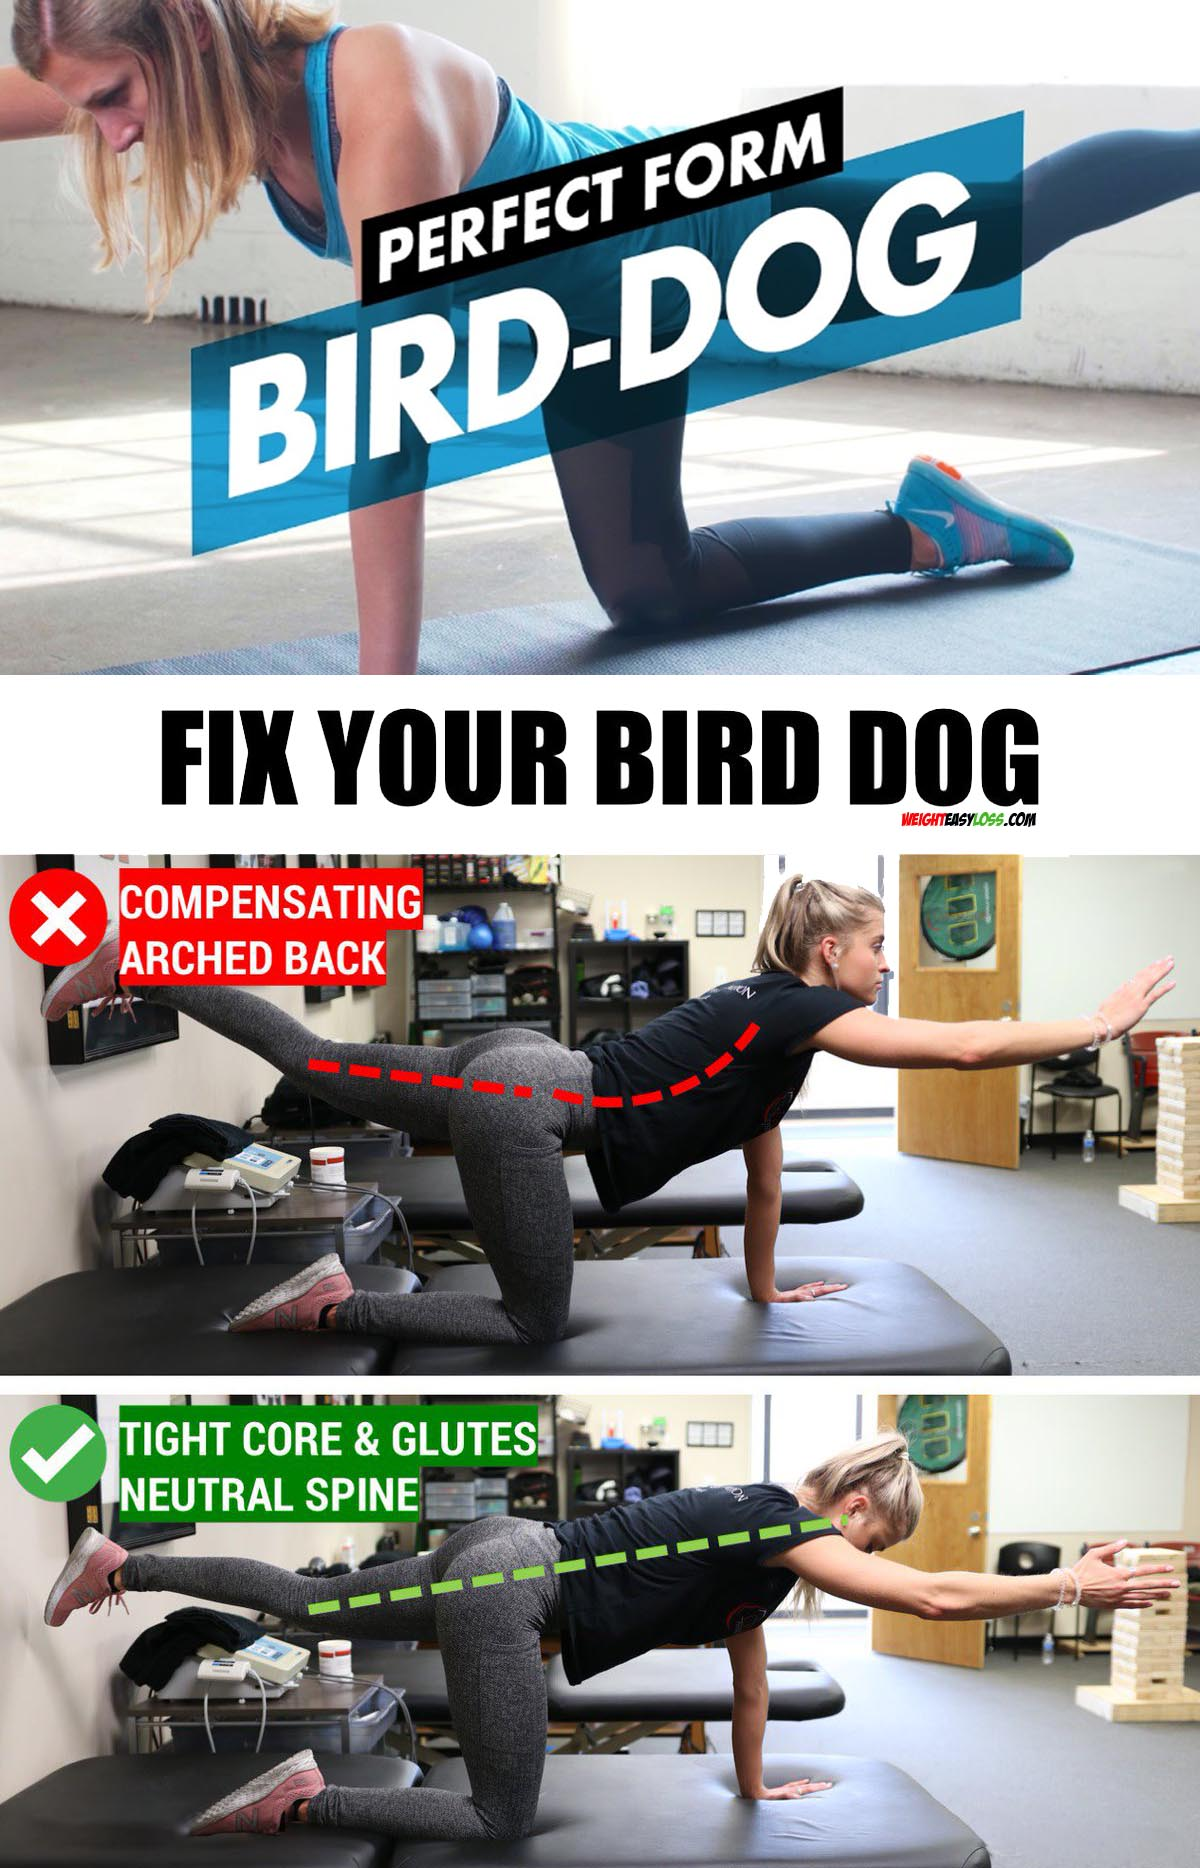 Perfect form Bird Dog